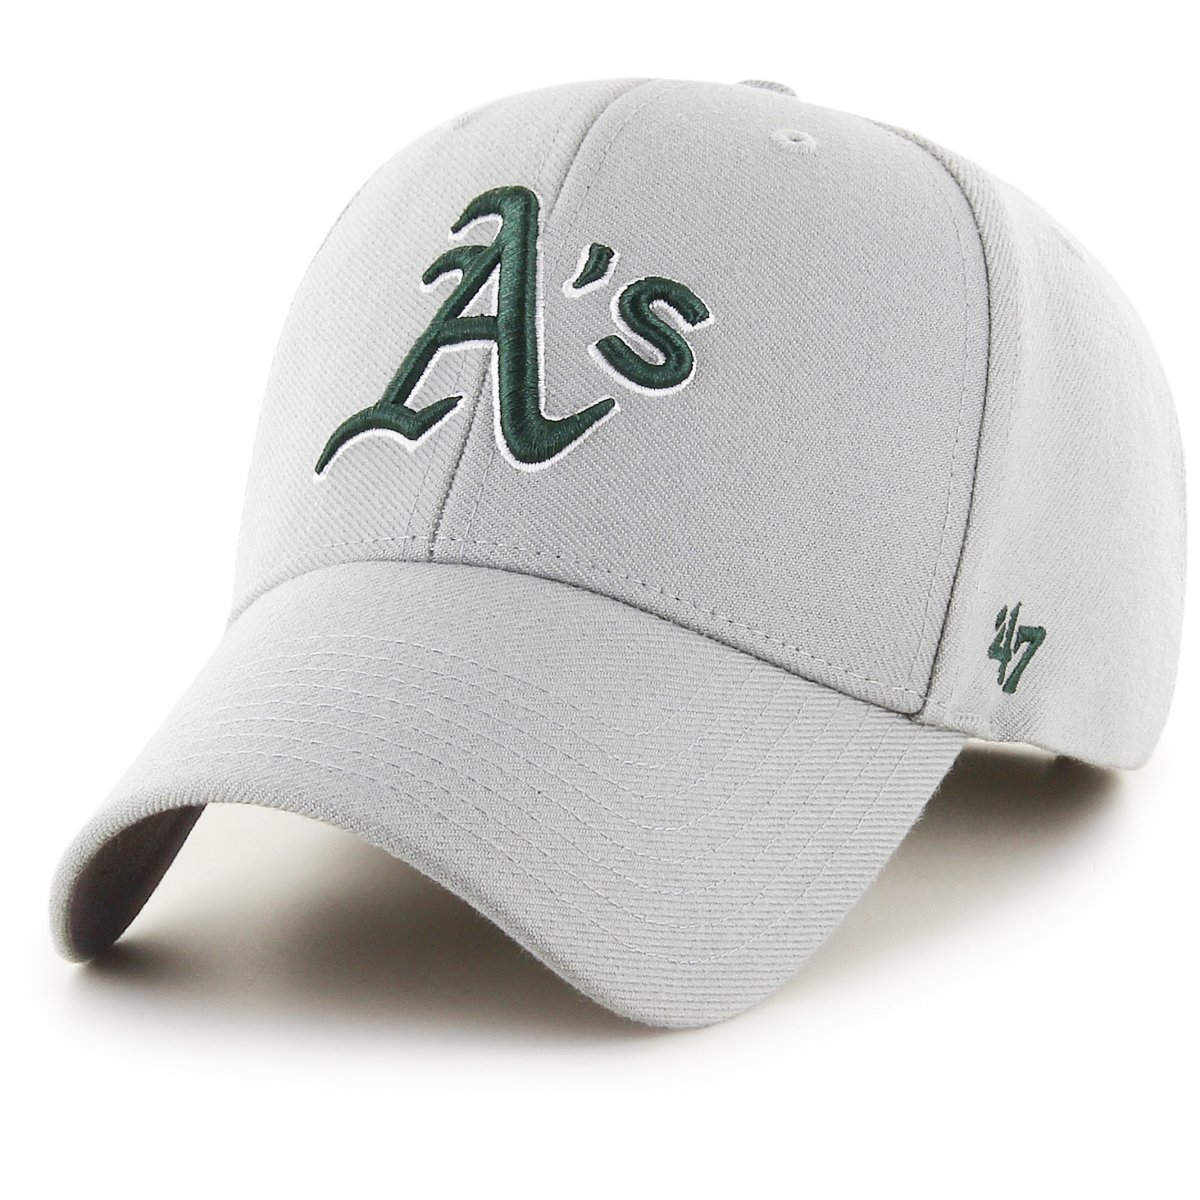 '47 MLB Oakland Athletics '47 MVP Cap 47 Brand B-MVP18WBV-GY